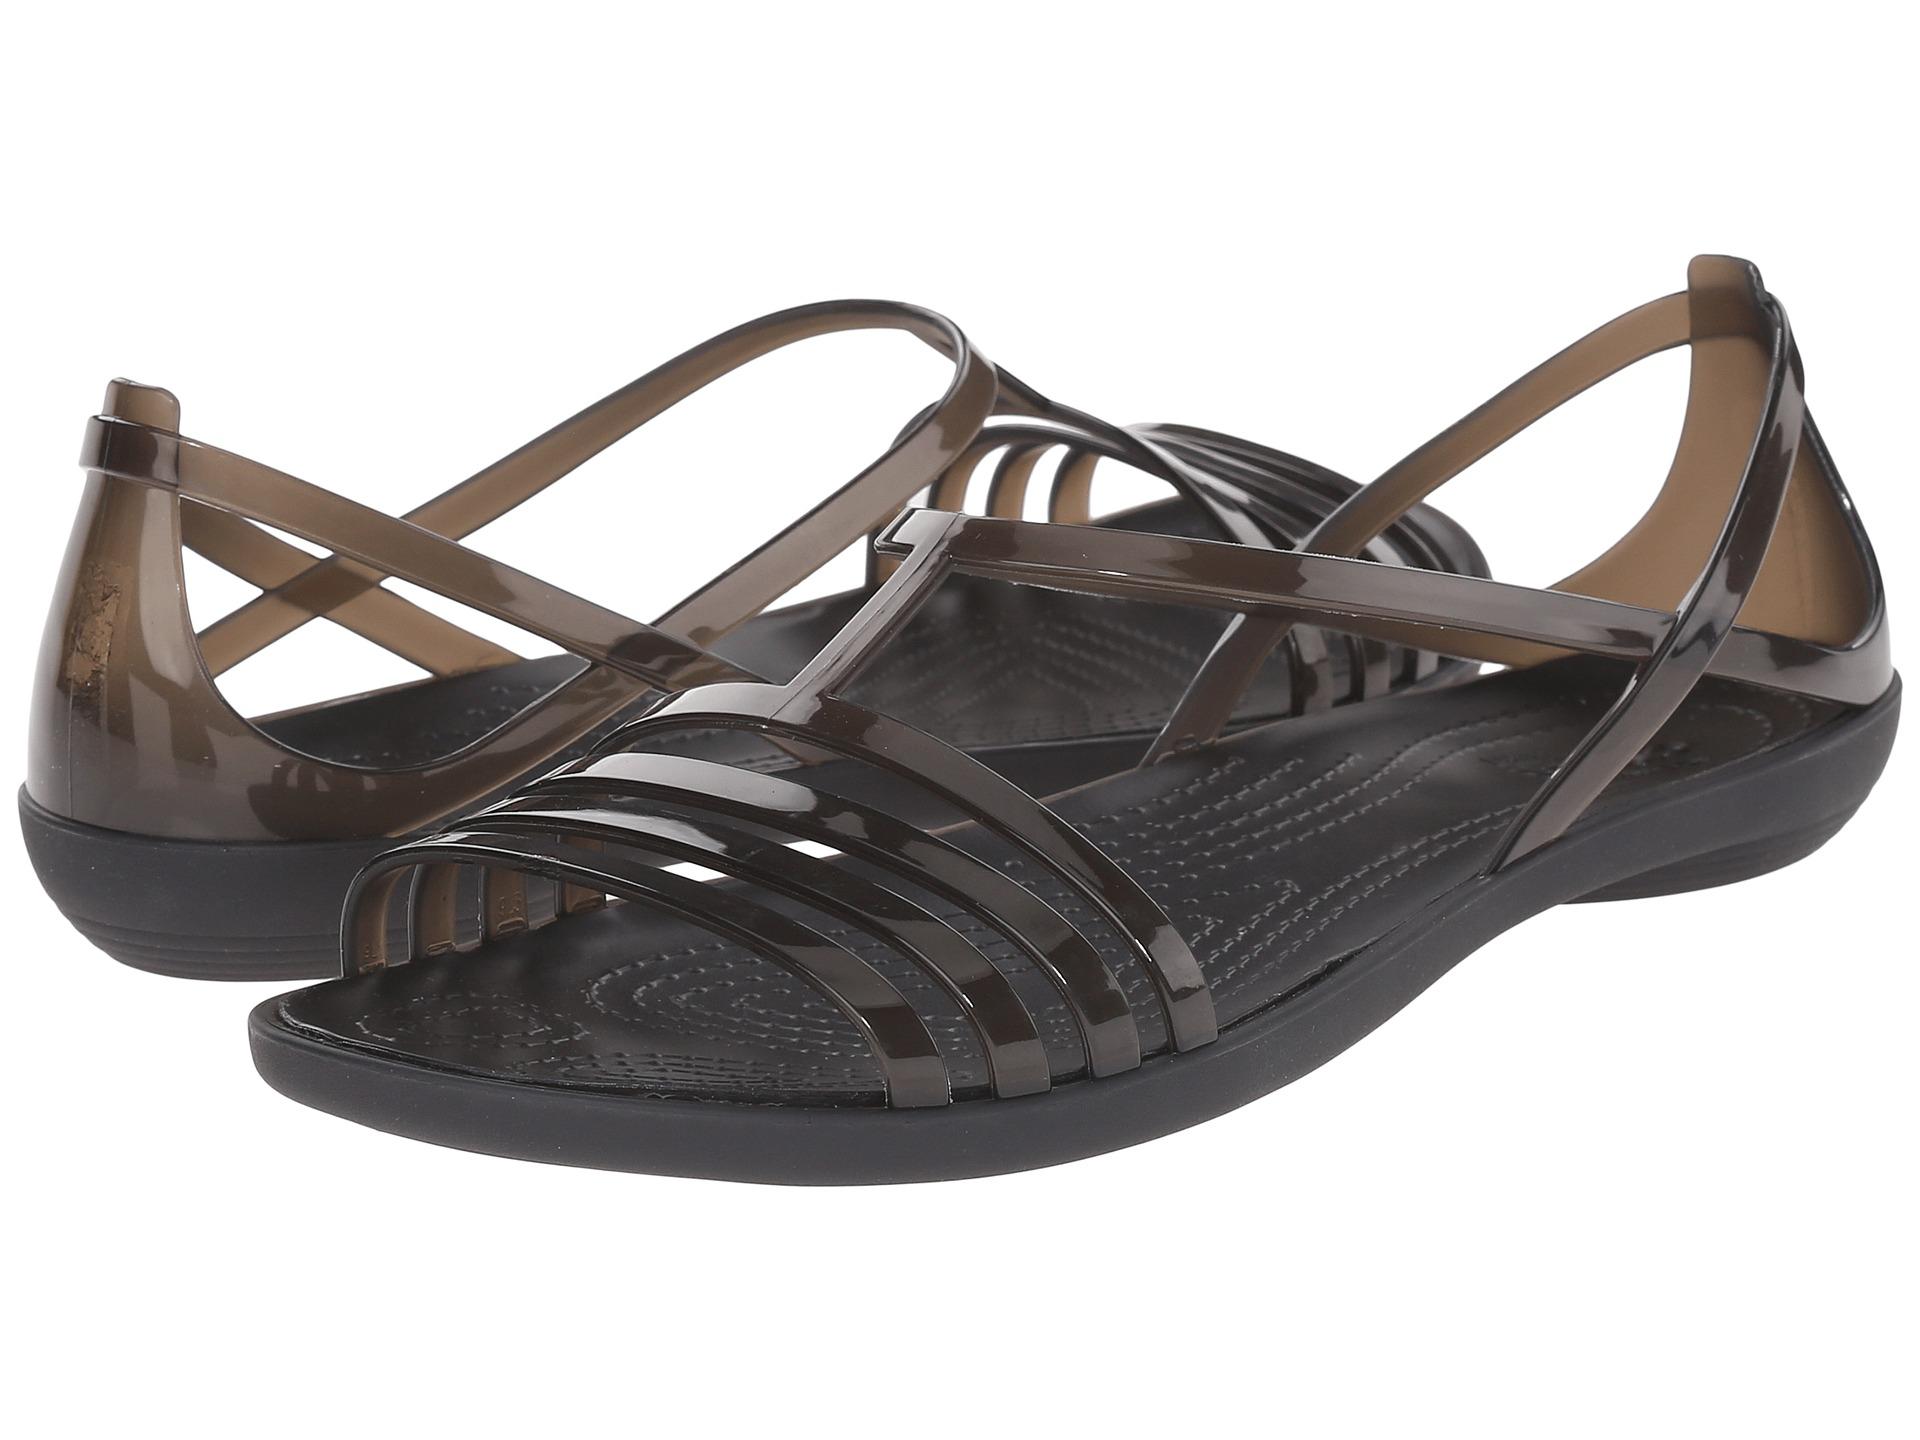 Lavender sandals shoes - View More Like This Crocs Isabella Sandal